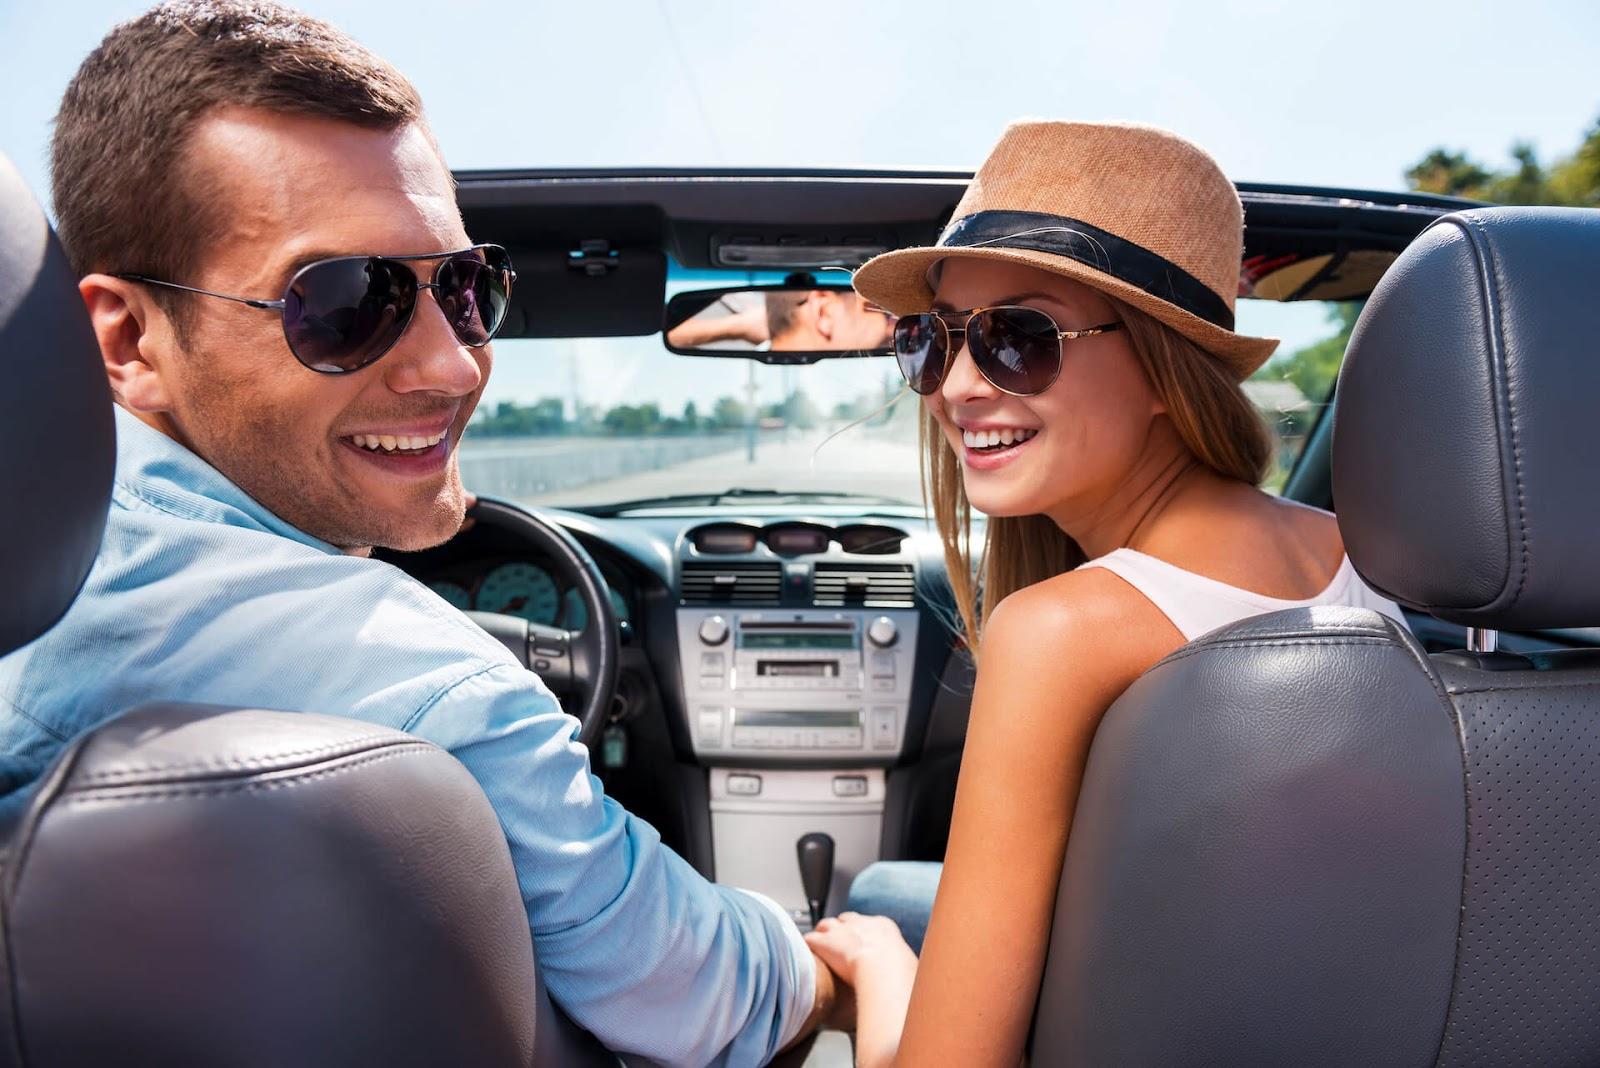 Man and woman enjoying a convertible car rental on vacation